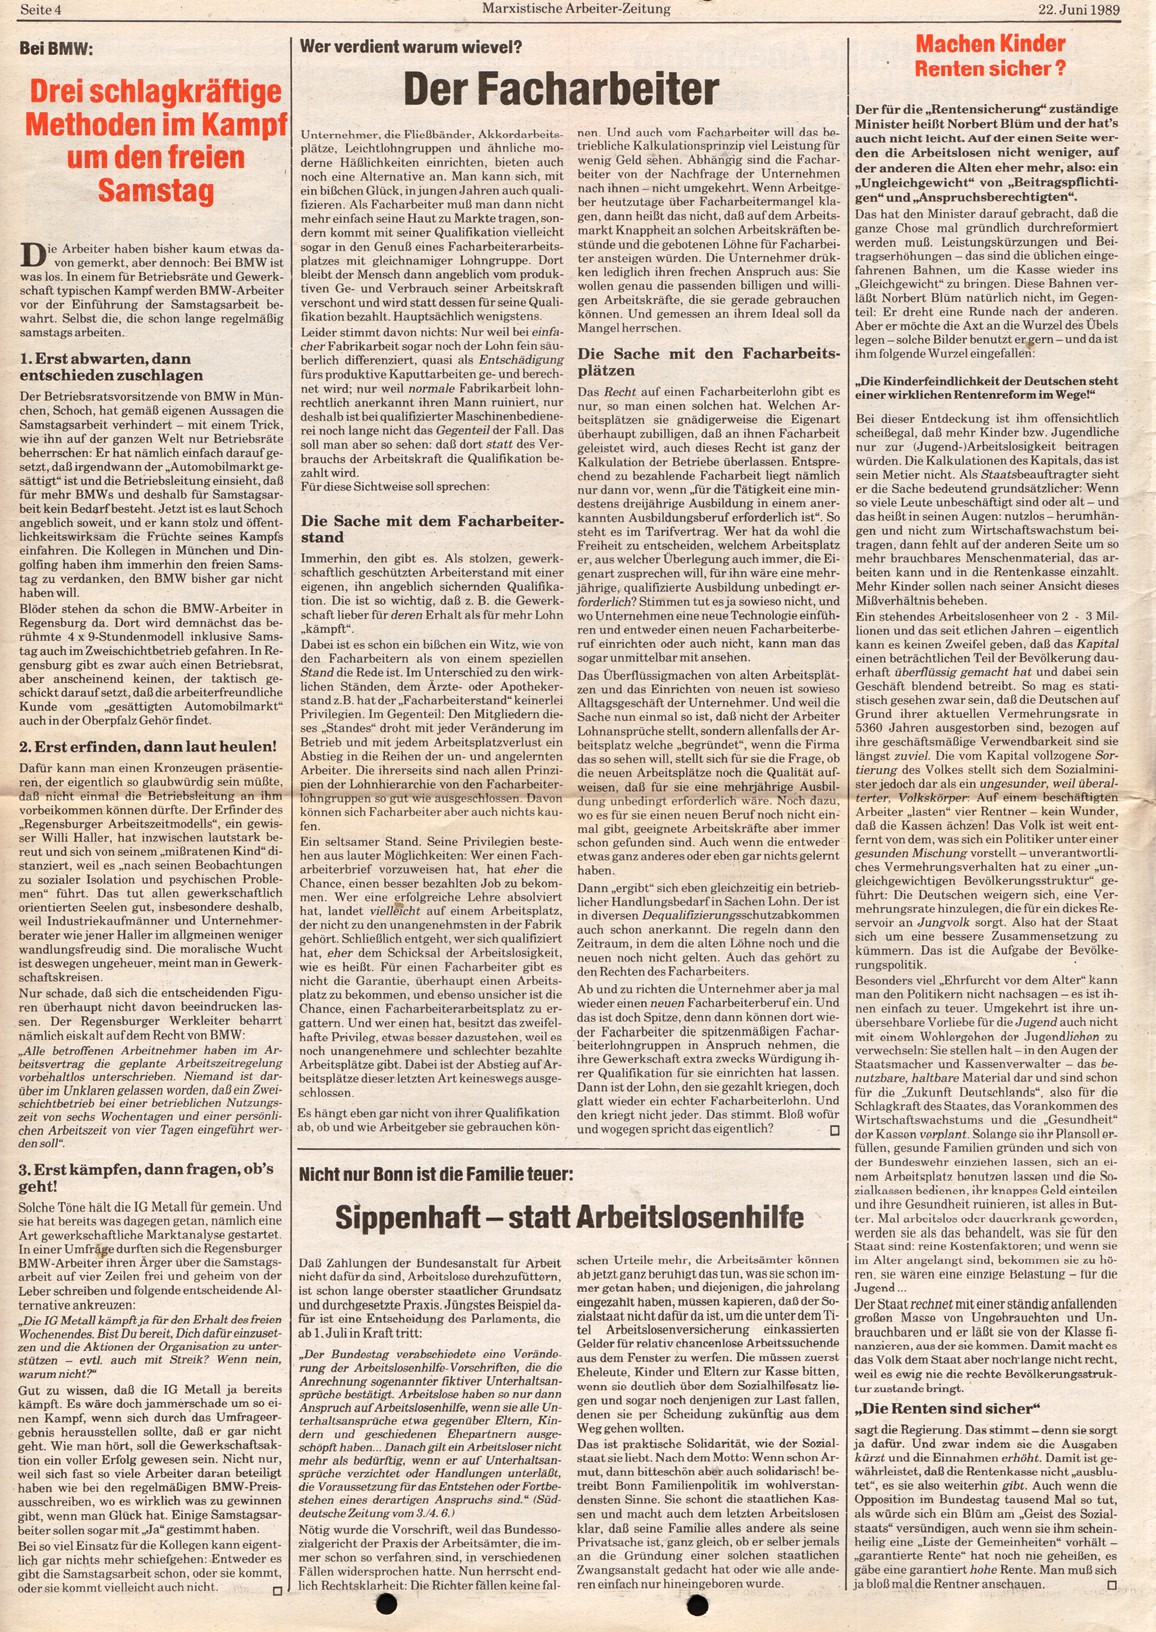 Muenchen_MG_MAZ_19890622_04